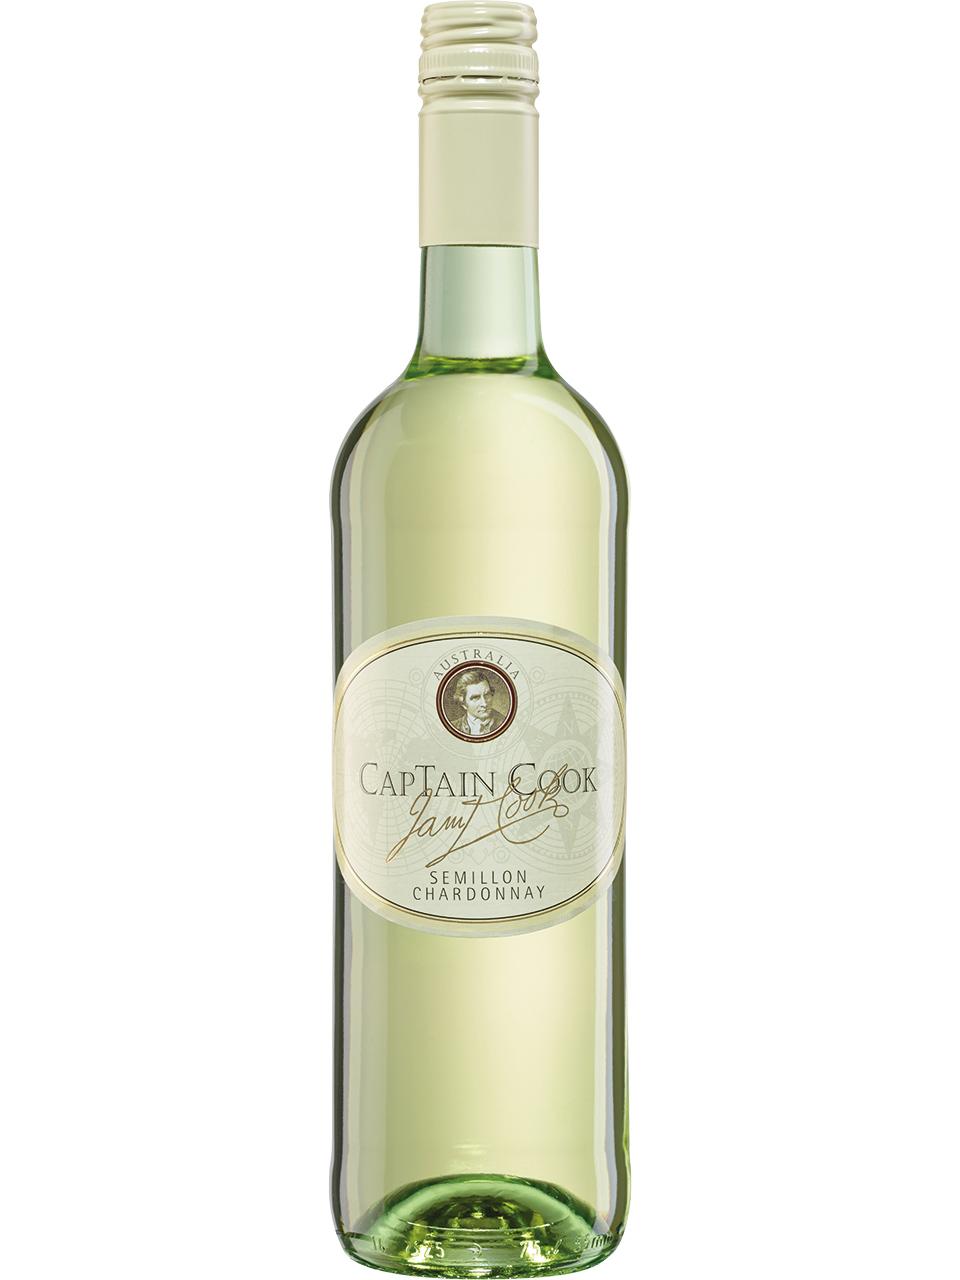 Captain Cook Semillon Chardonnay